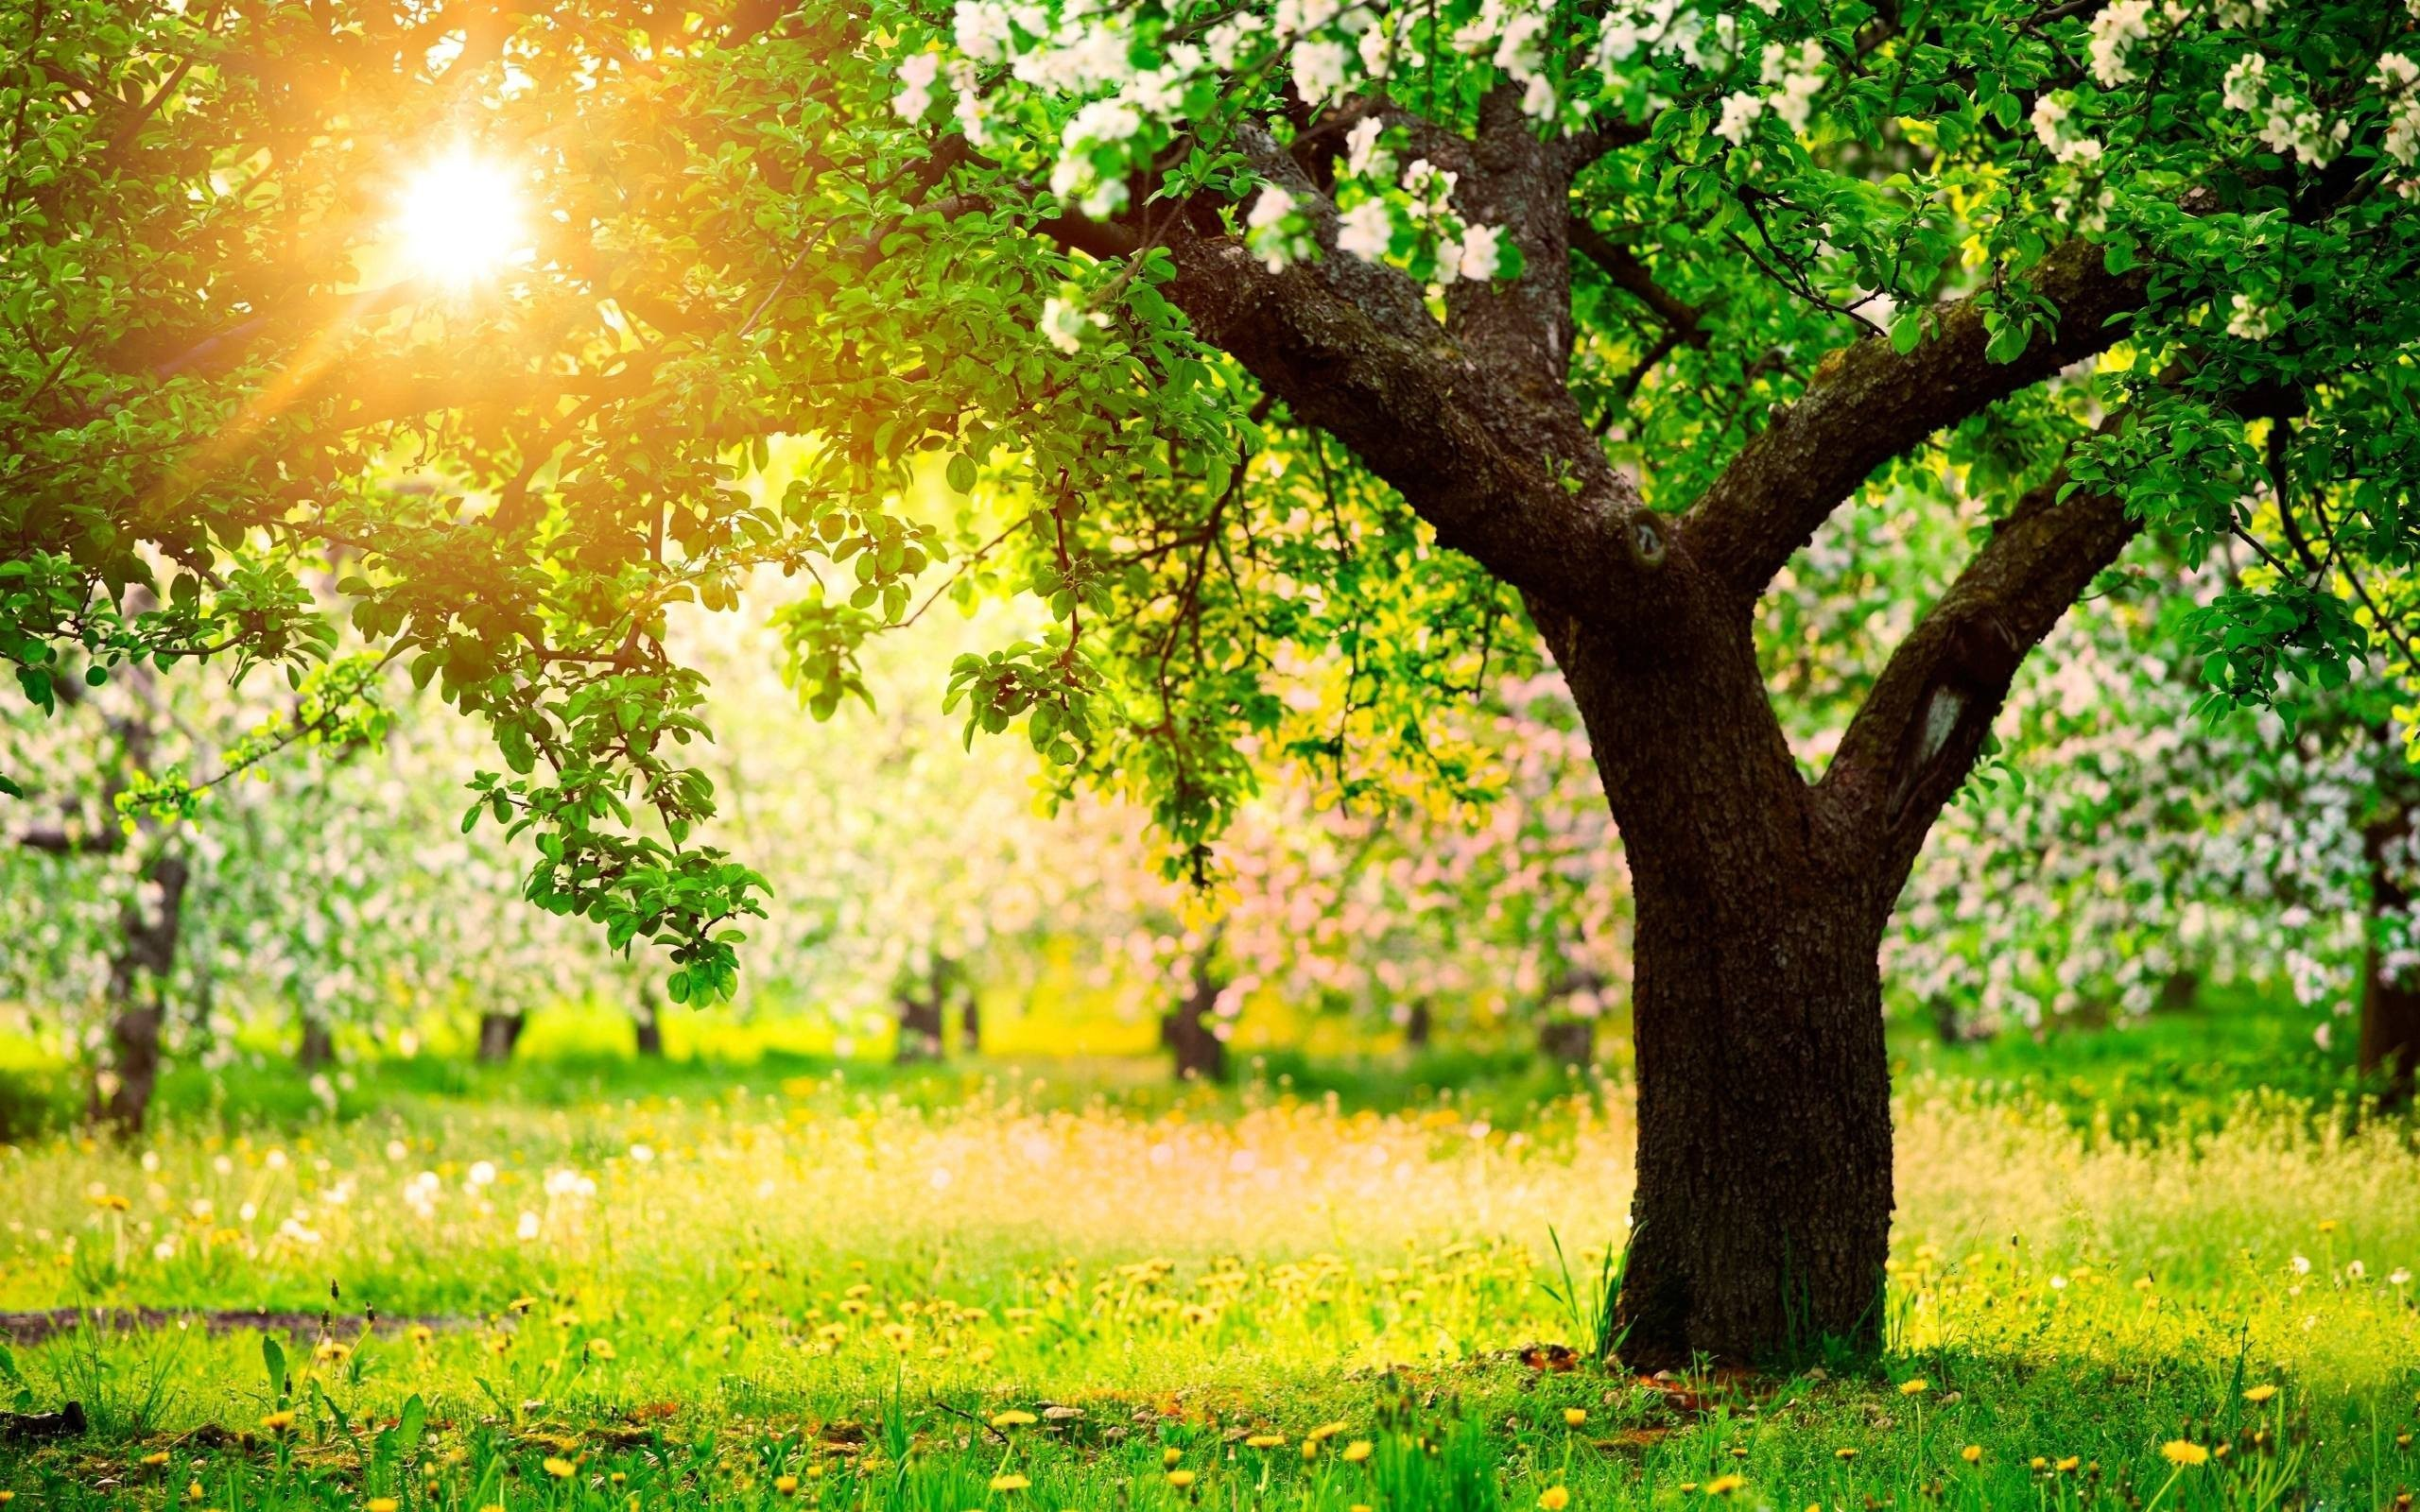 Download Nature Wallpapers Full HD 1080p Photo Desktop Backgrounds 2560x1600